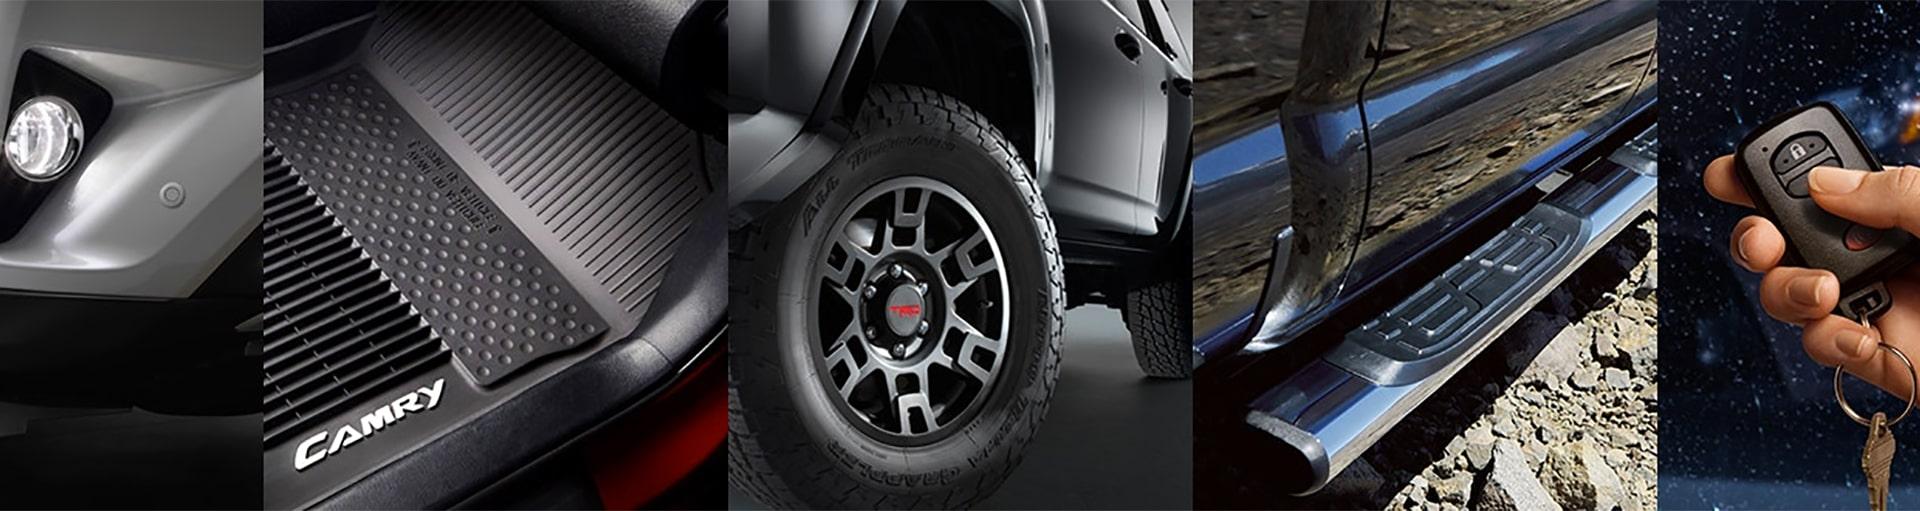 Russ Darrow Toyota West Bend Accessories Department